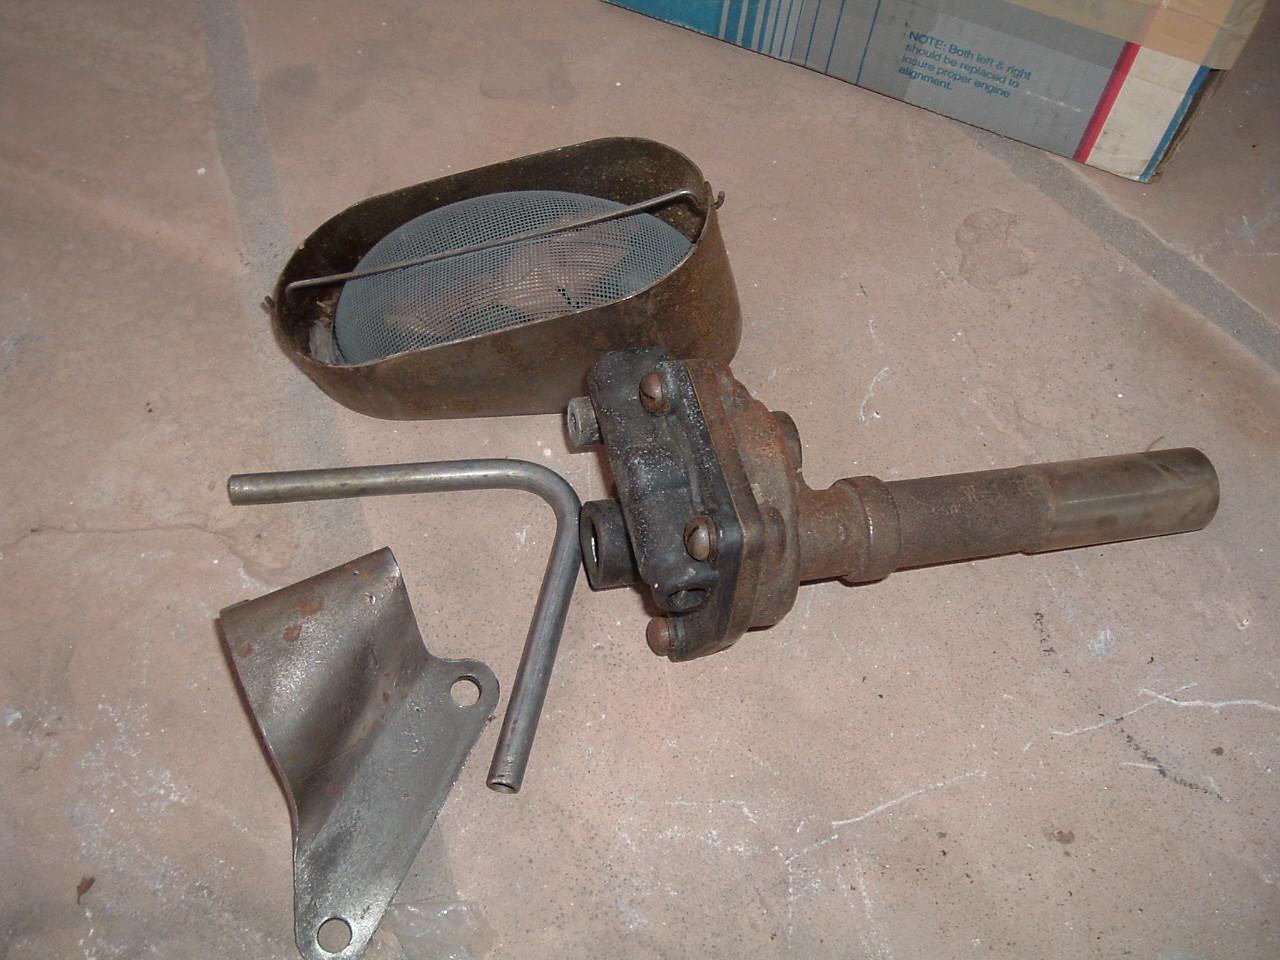 1937 1938 1939 chevrolet oil pump new gm # 838440 (z 838440)